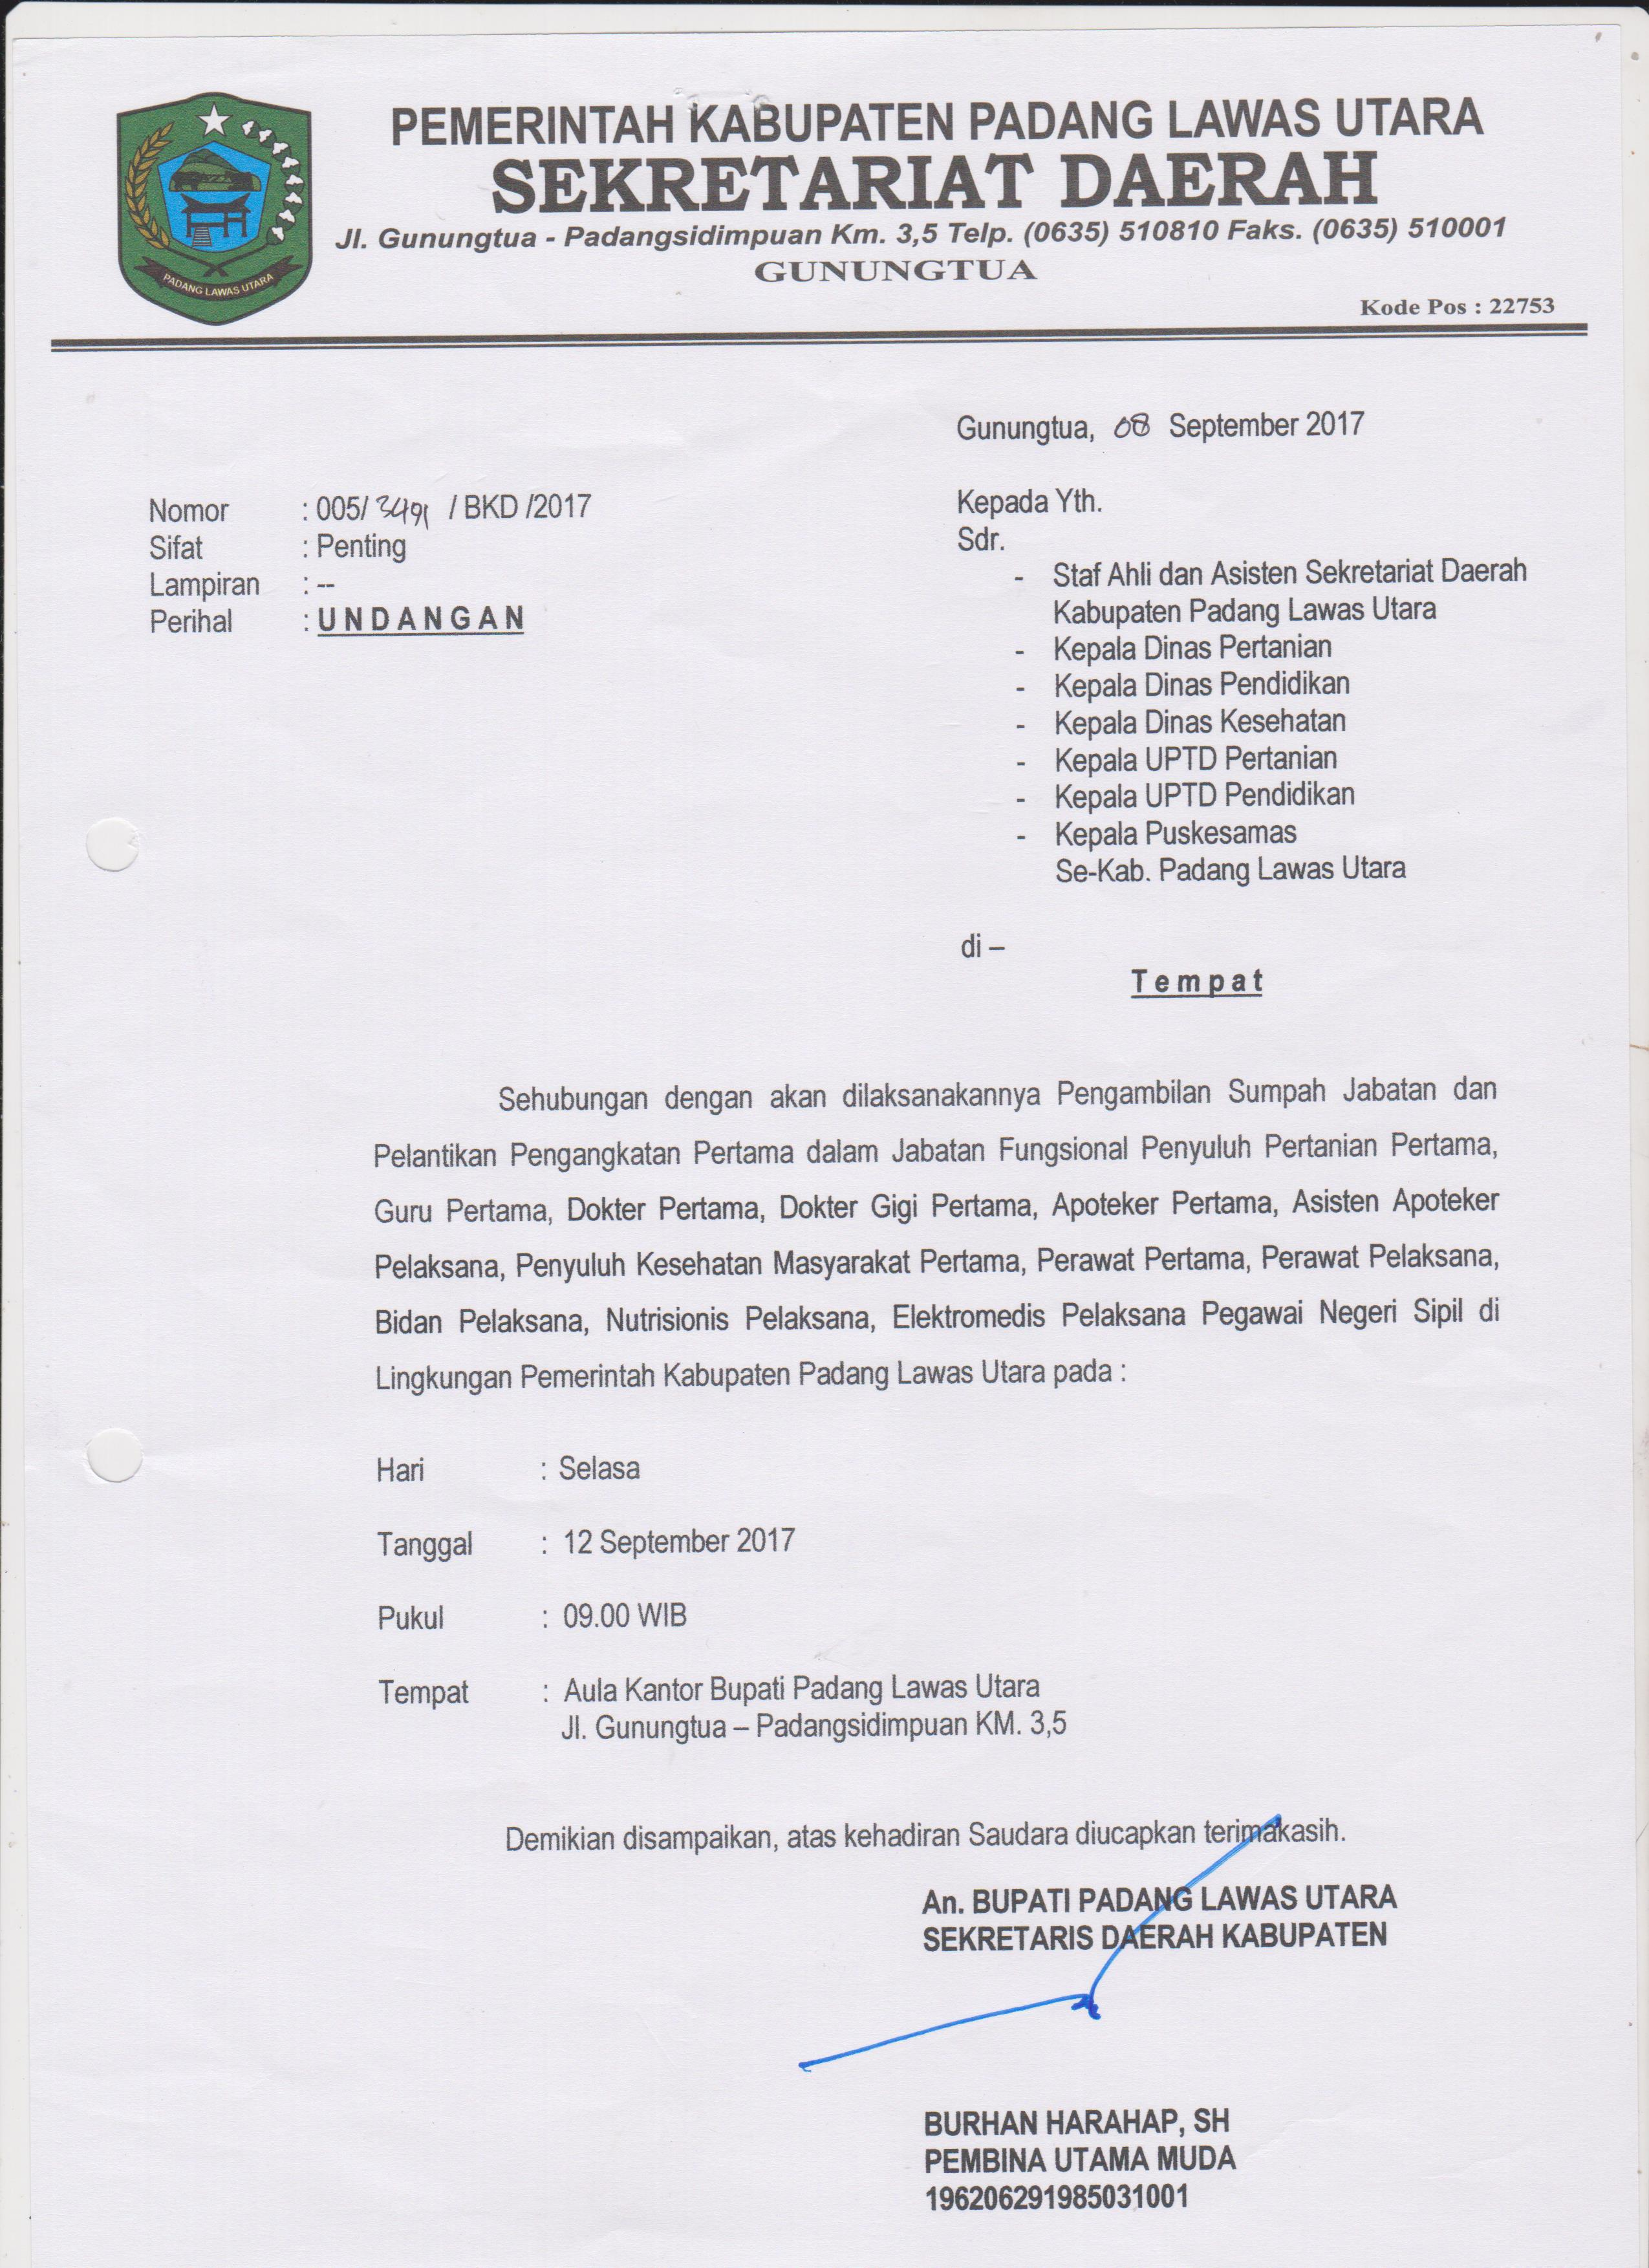 Undangan Pengambilan Sumpah Jabatan Pns Jft Di Lingkungan Pemerintah Kabupaten Padang Lawas Utara